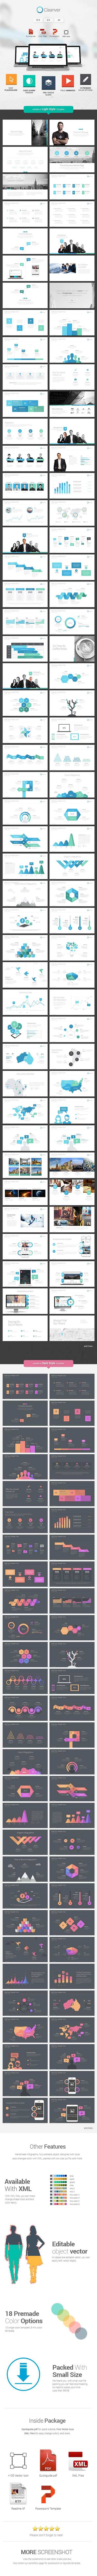 Cleanver - Clean Powerpoint Presentation